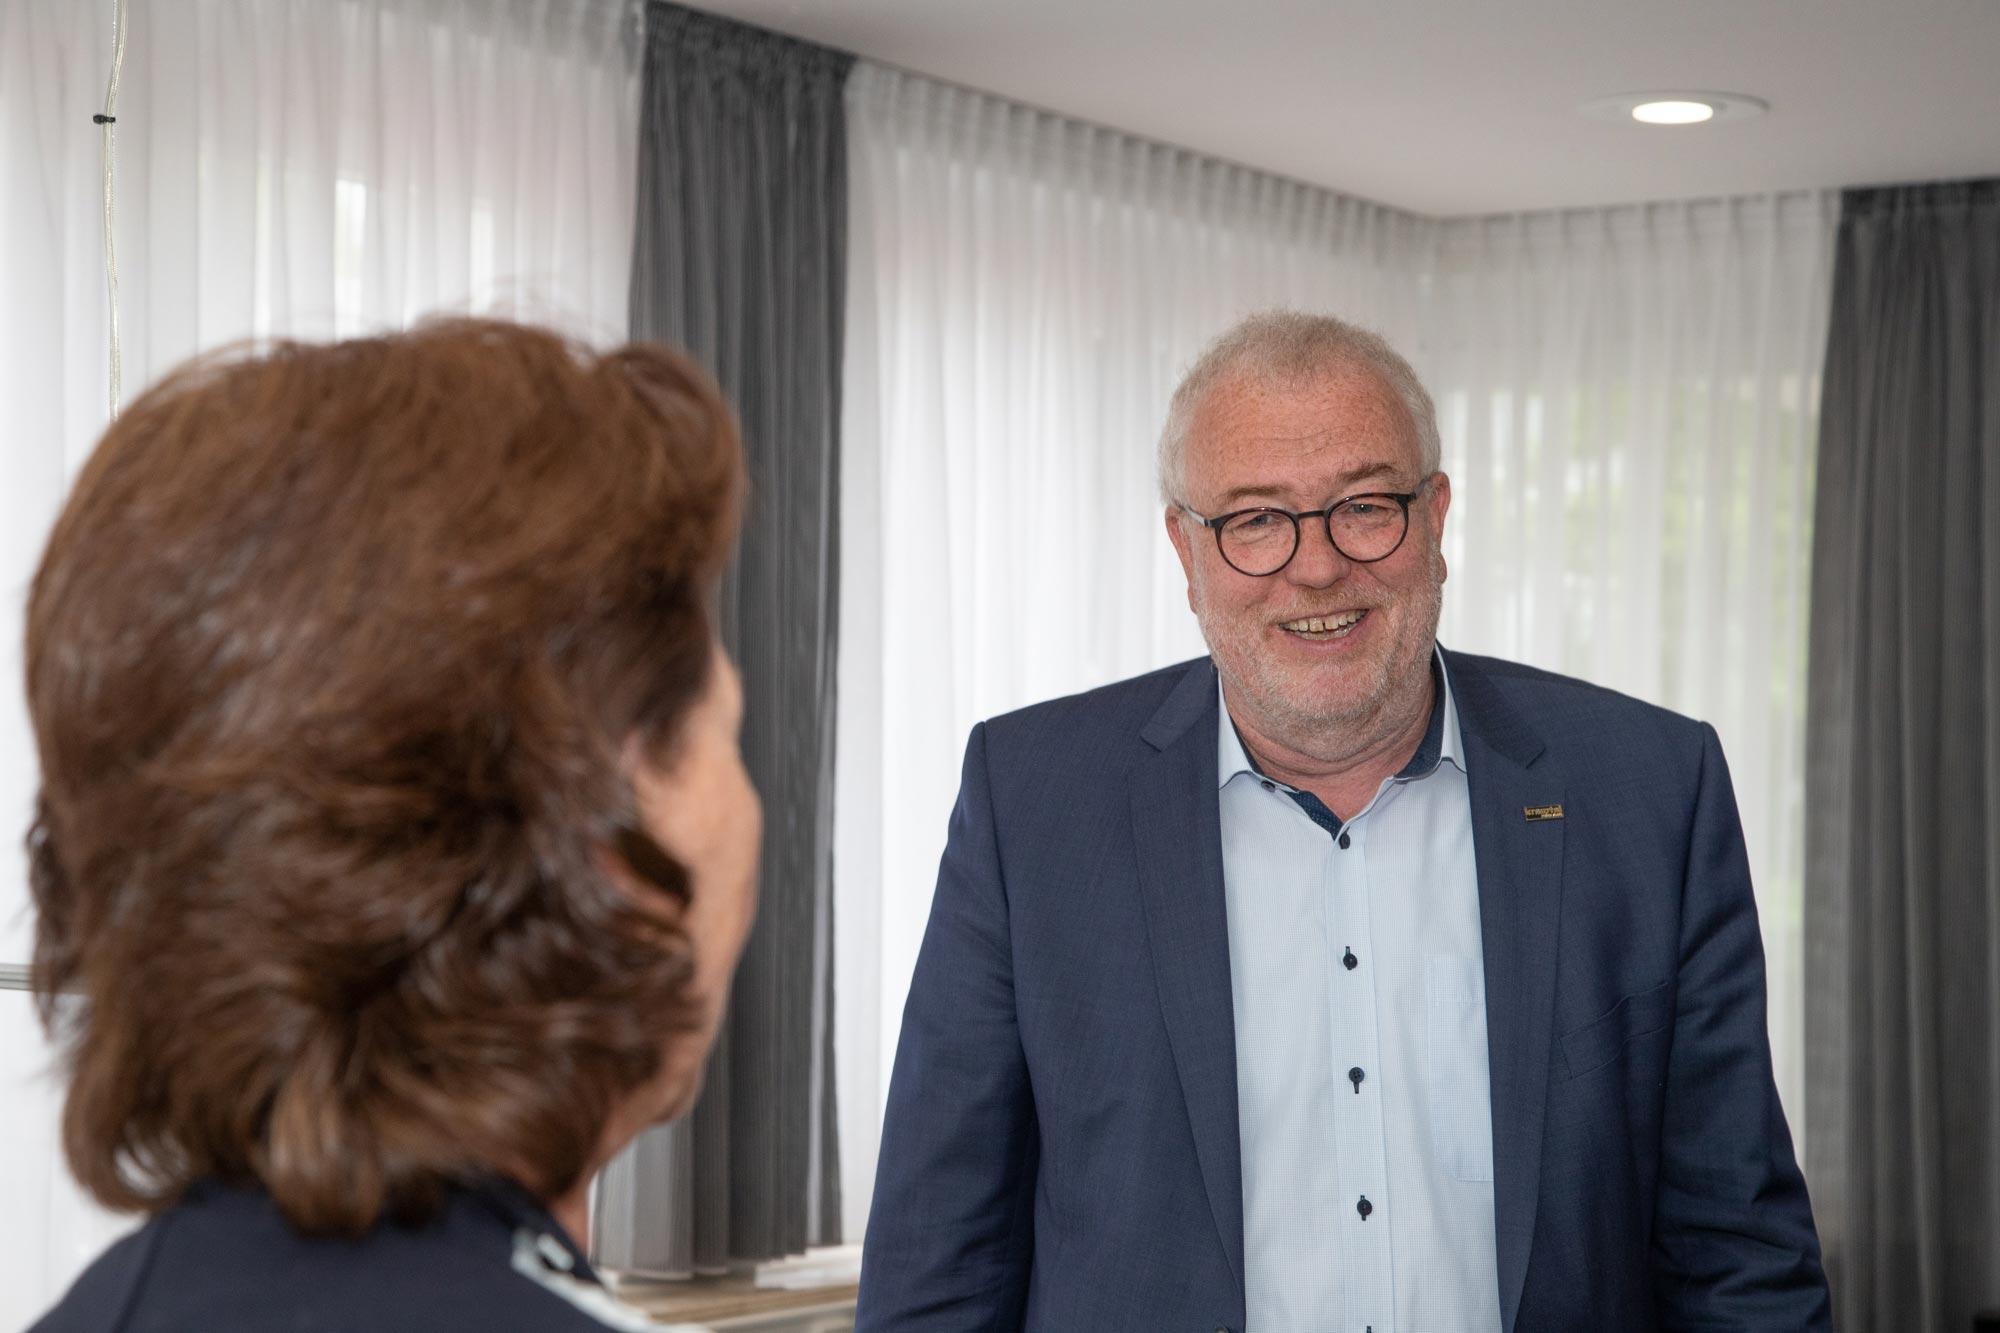 Walter Kiß, Bürgermeister der Stadt Kreuztal